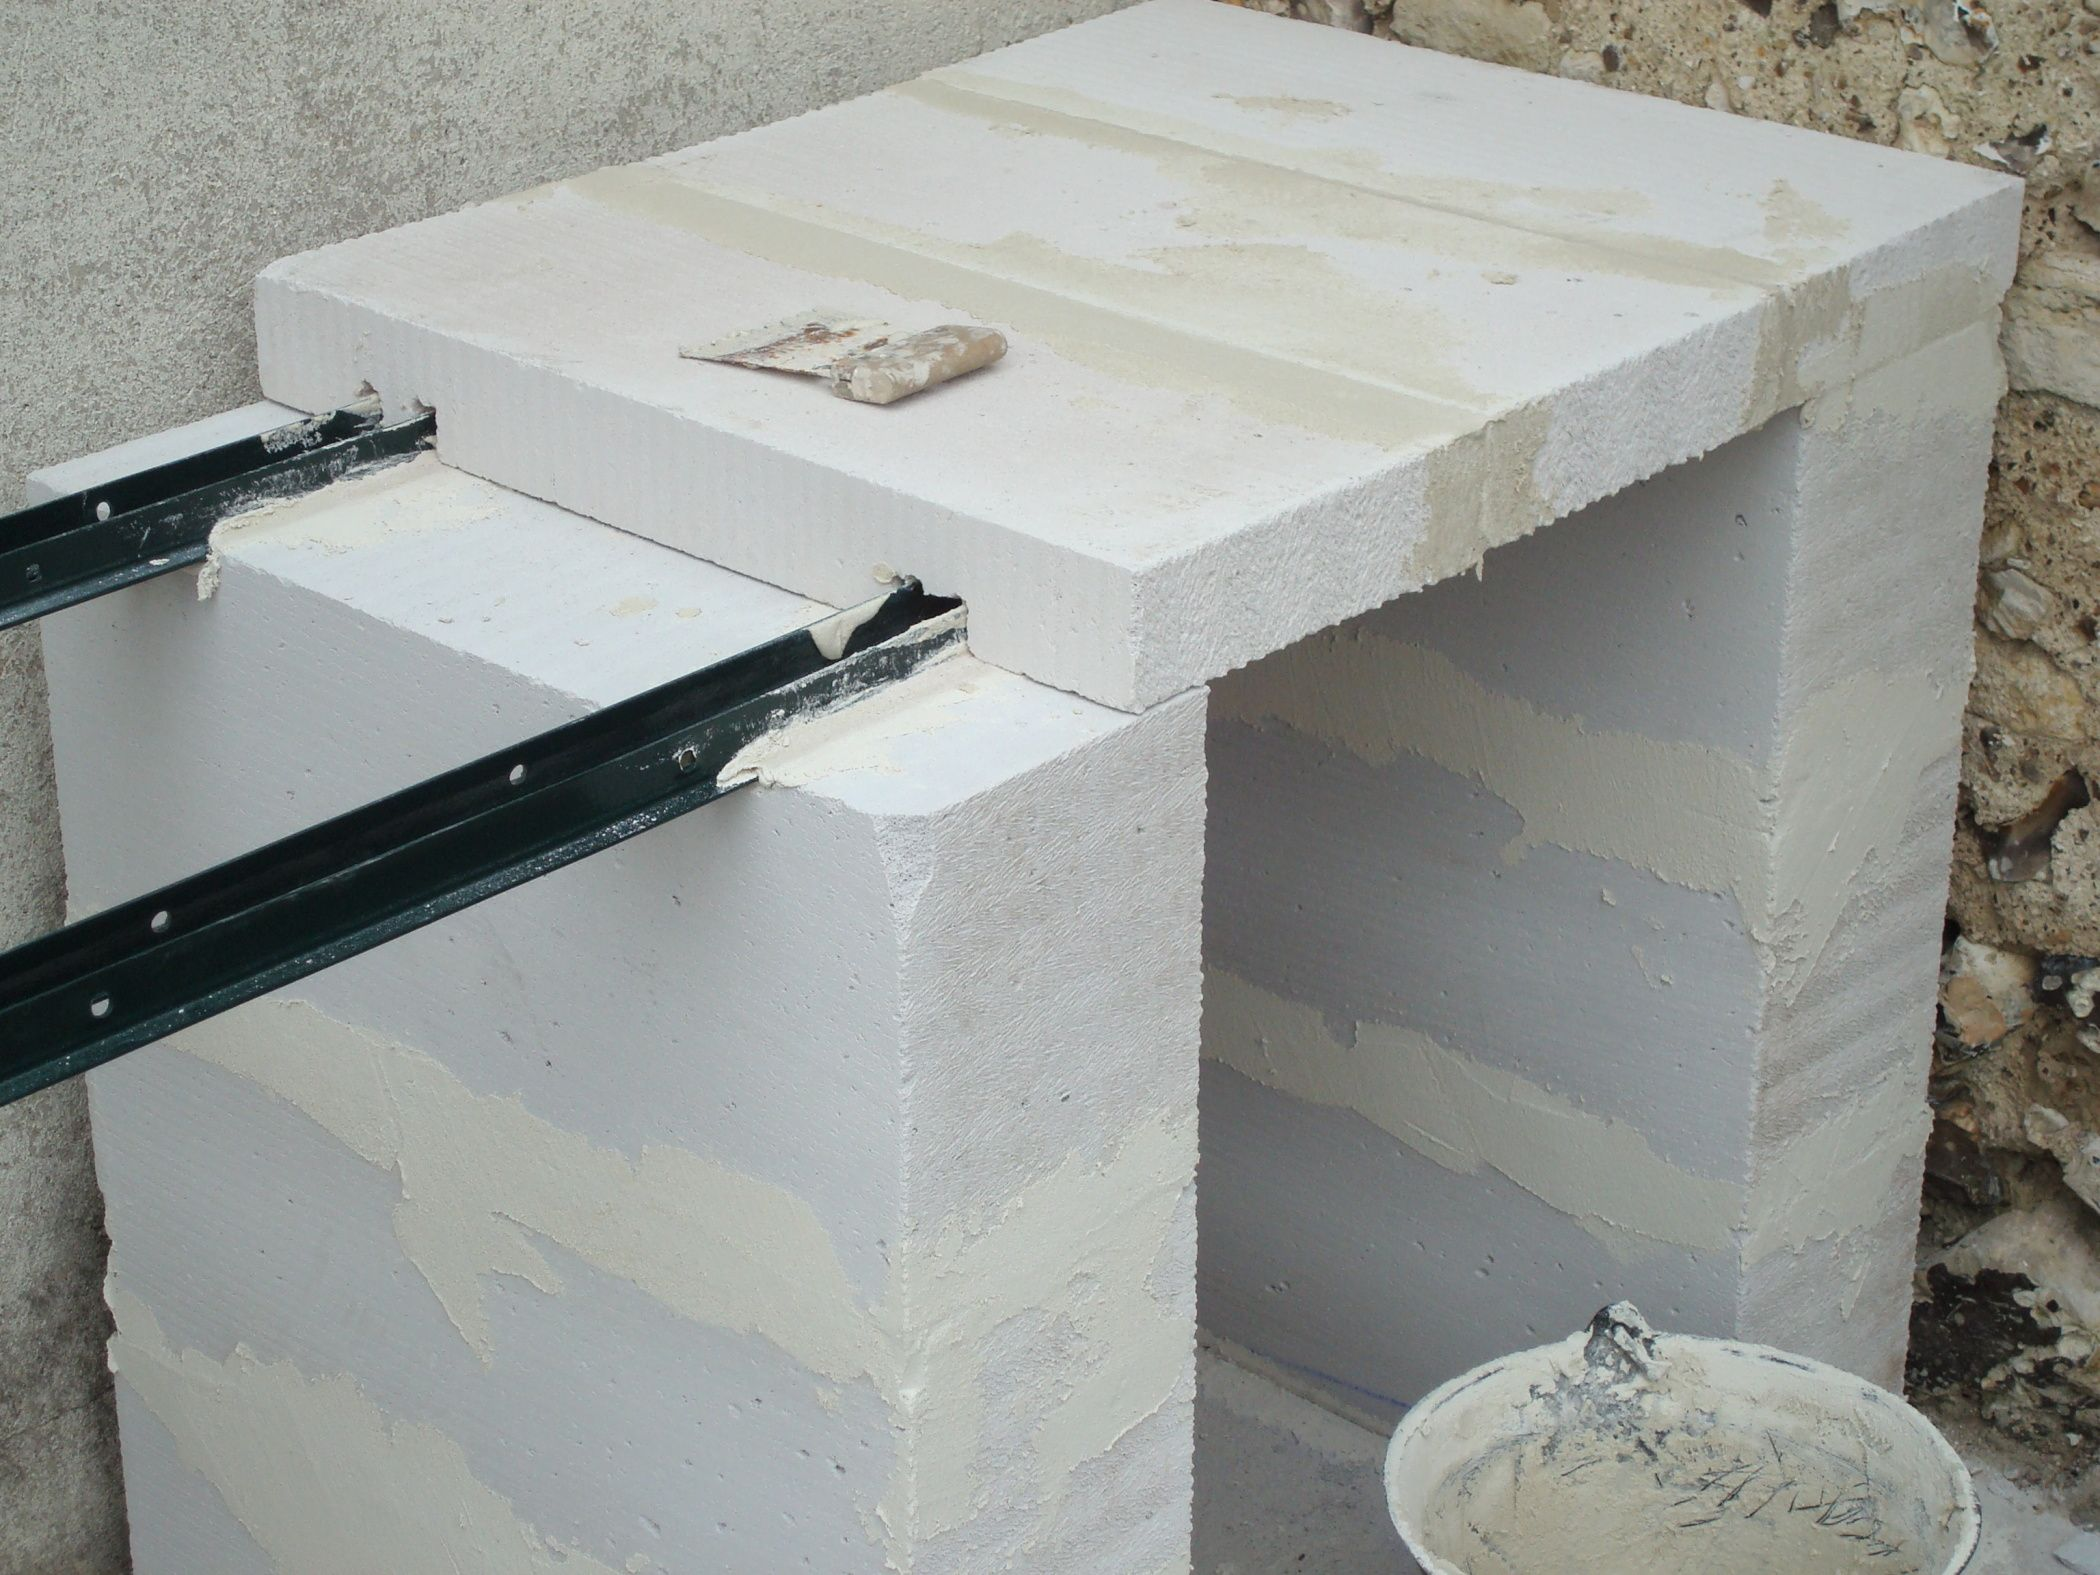 construction d 39 un barbecue sur mesure salamandras parrilla y horno. Black Bedroom Furniture Sets. Home Design Ideas